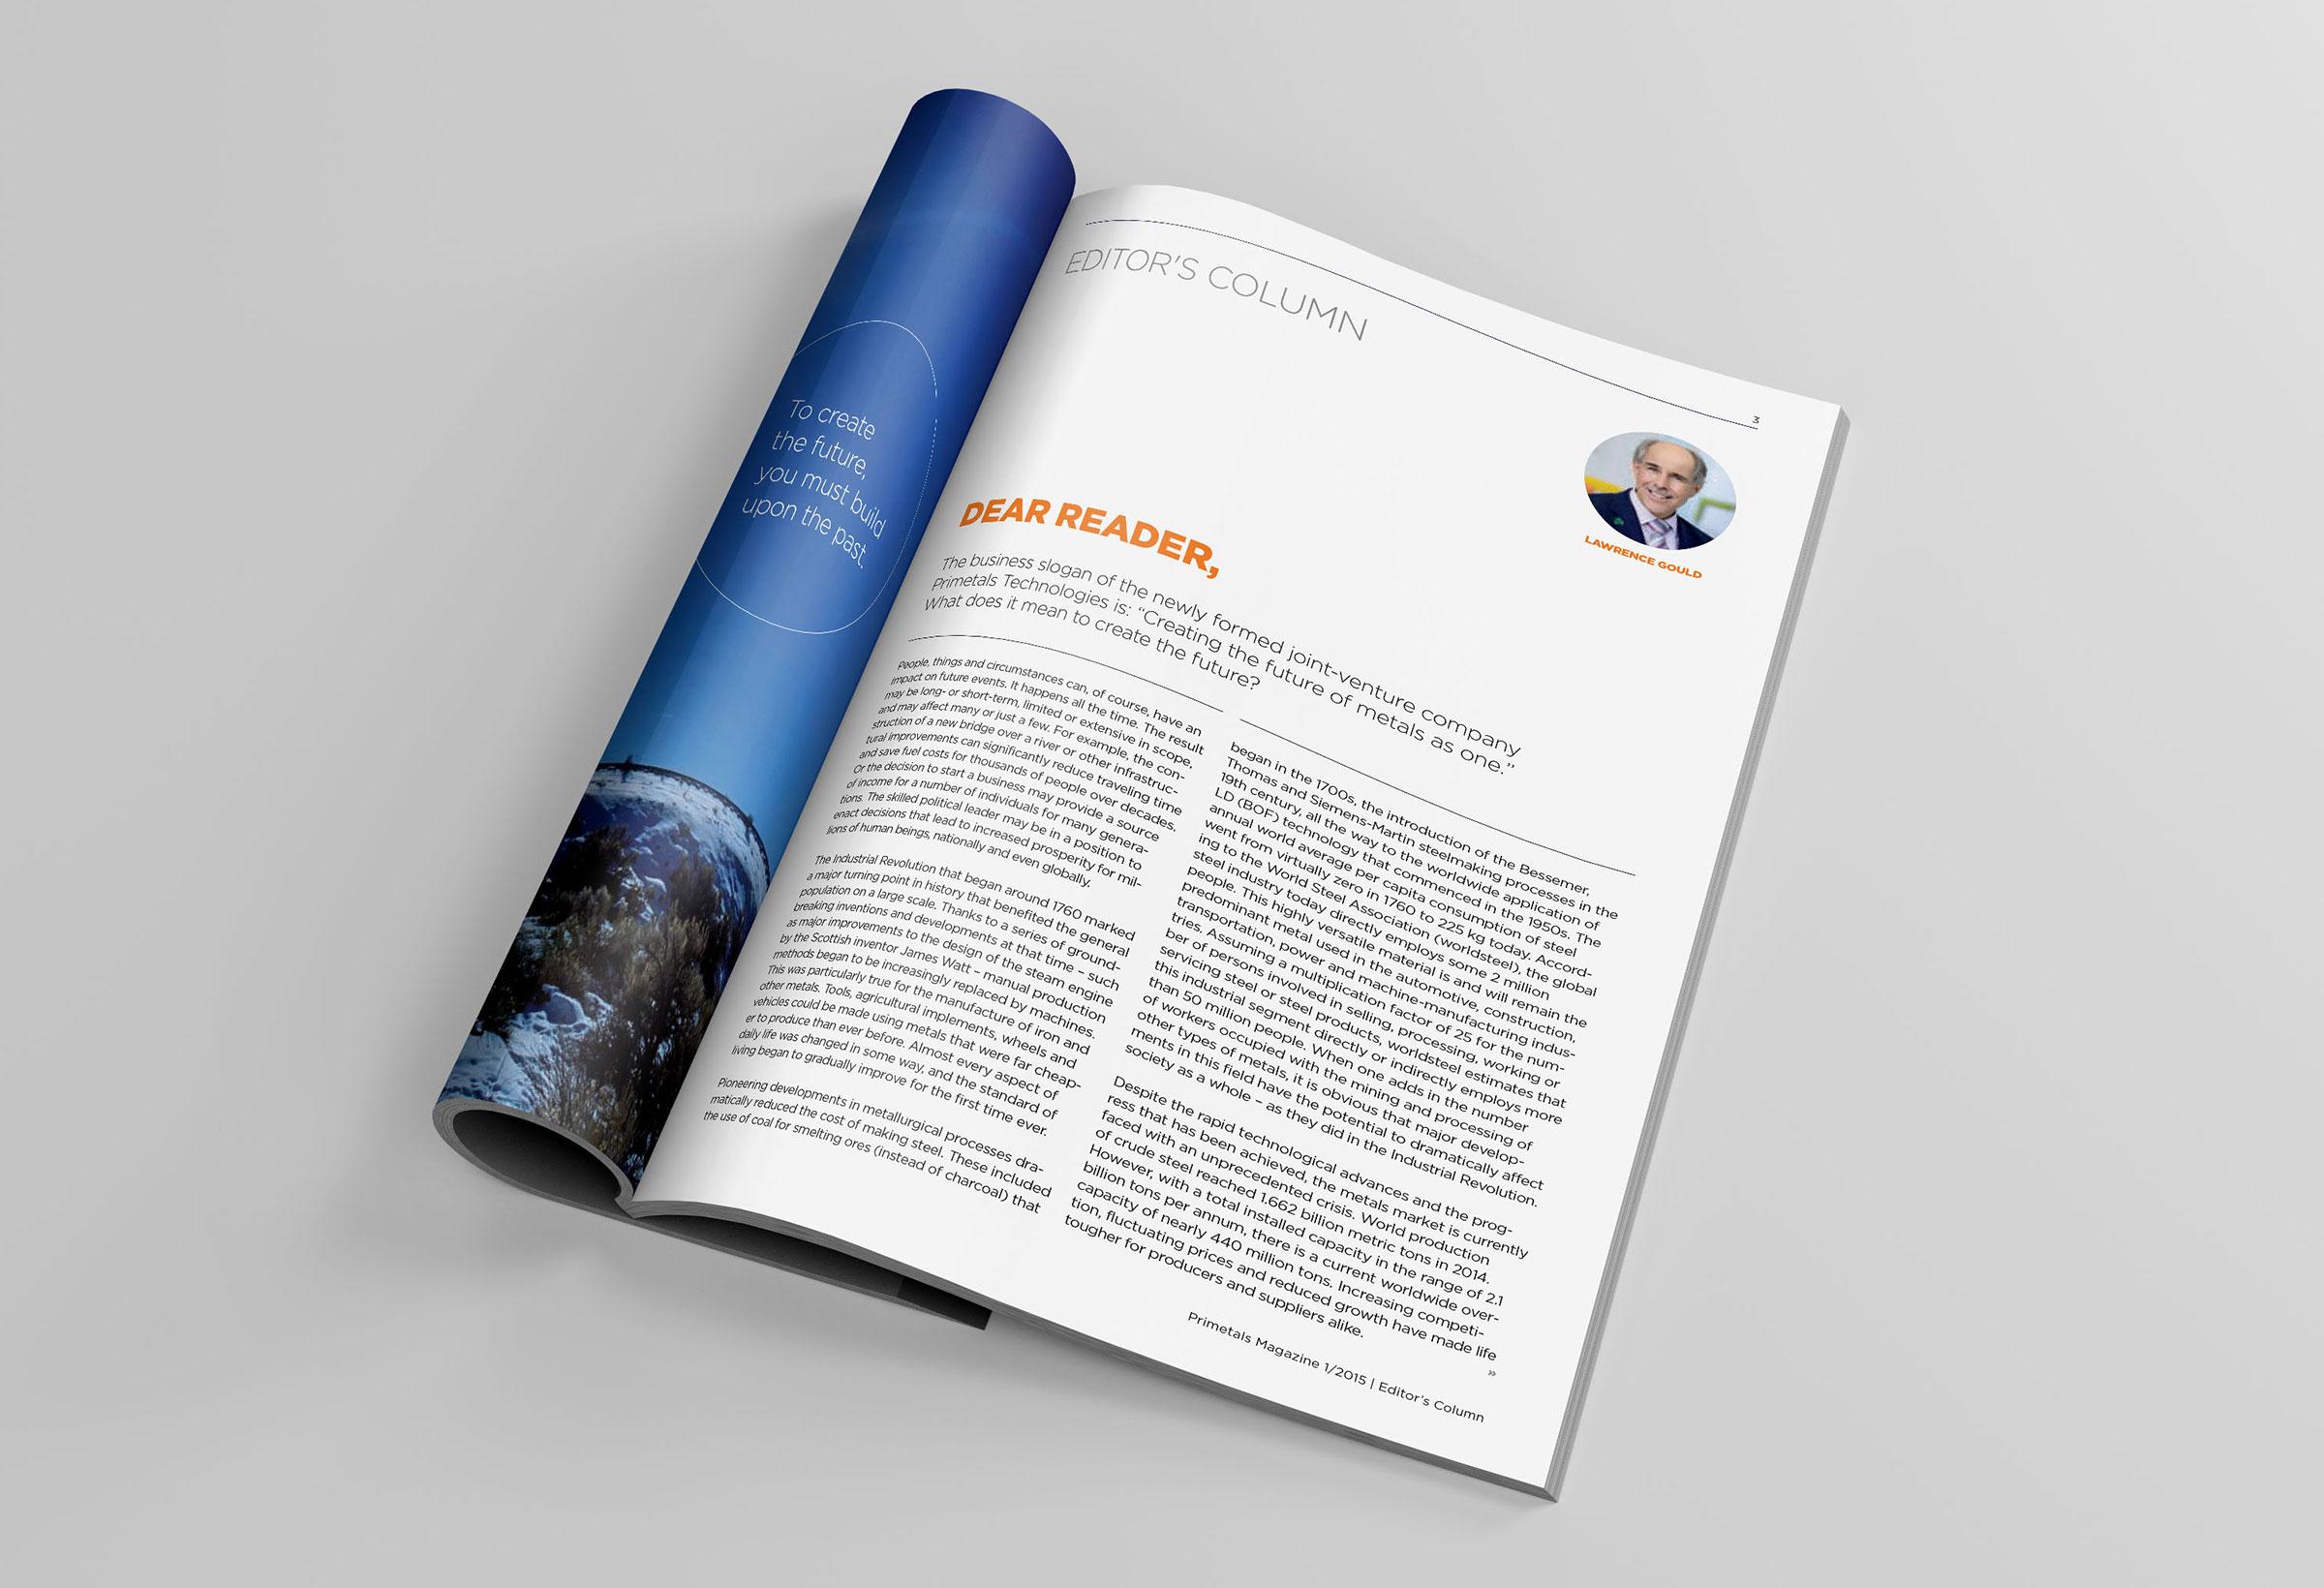 Primetals Metals Magazine inside layout of editors page